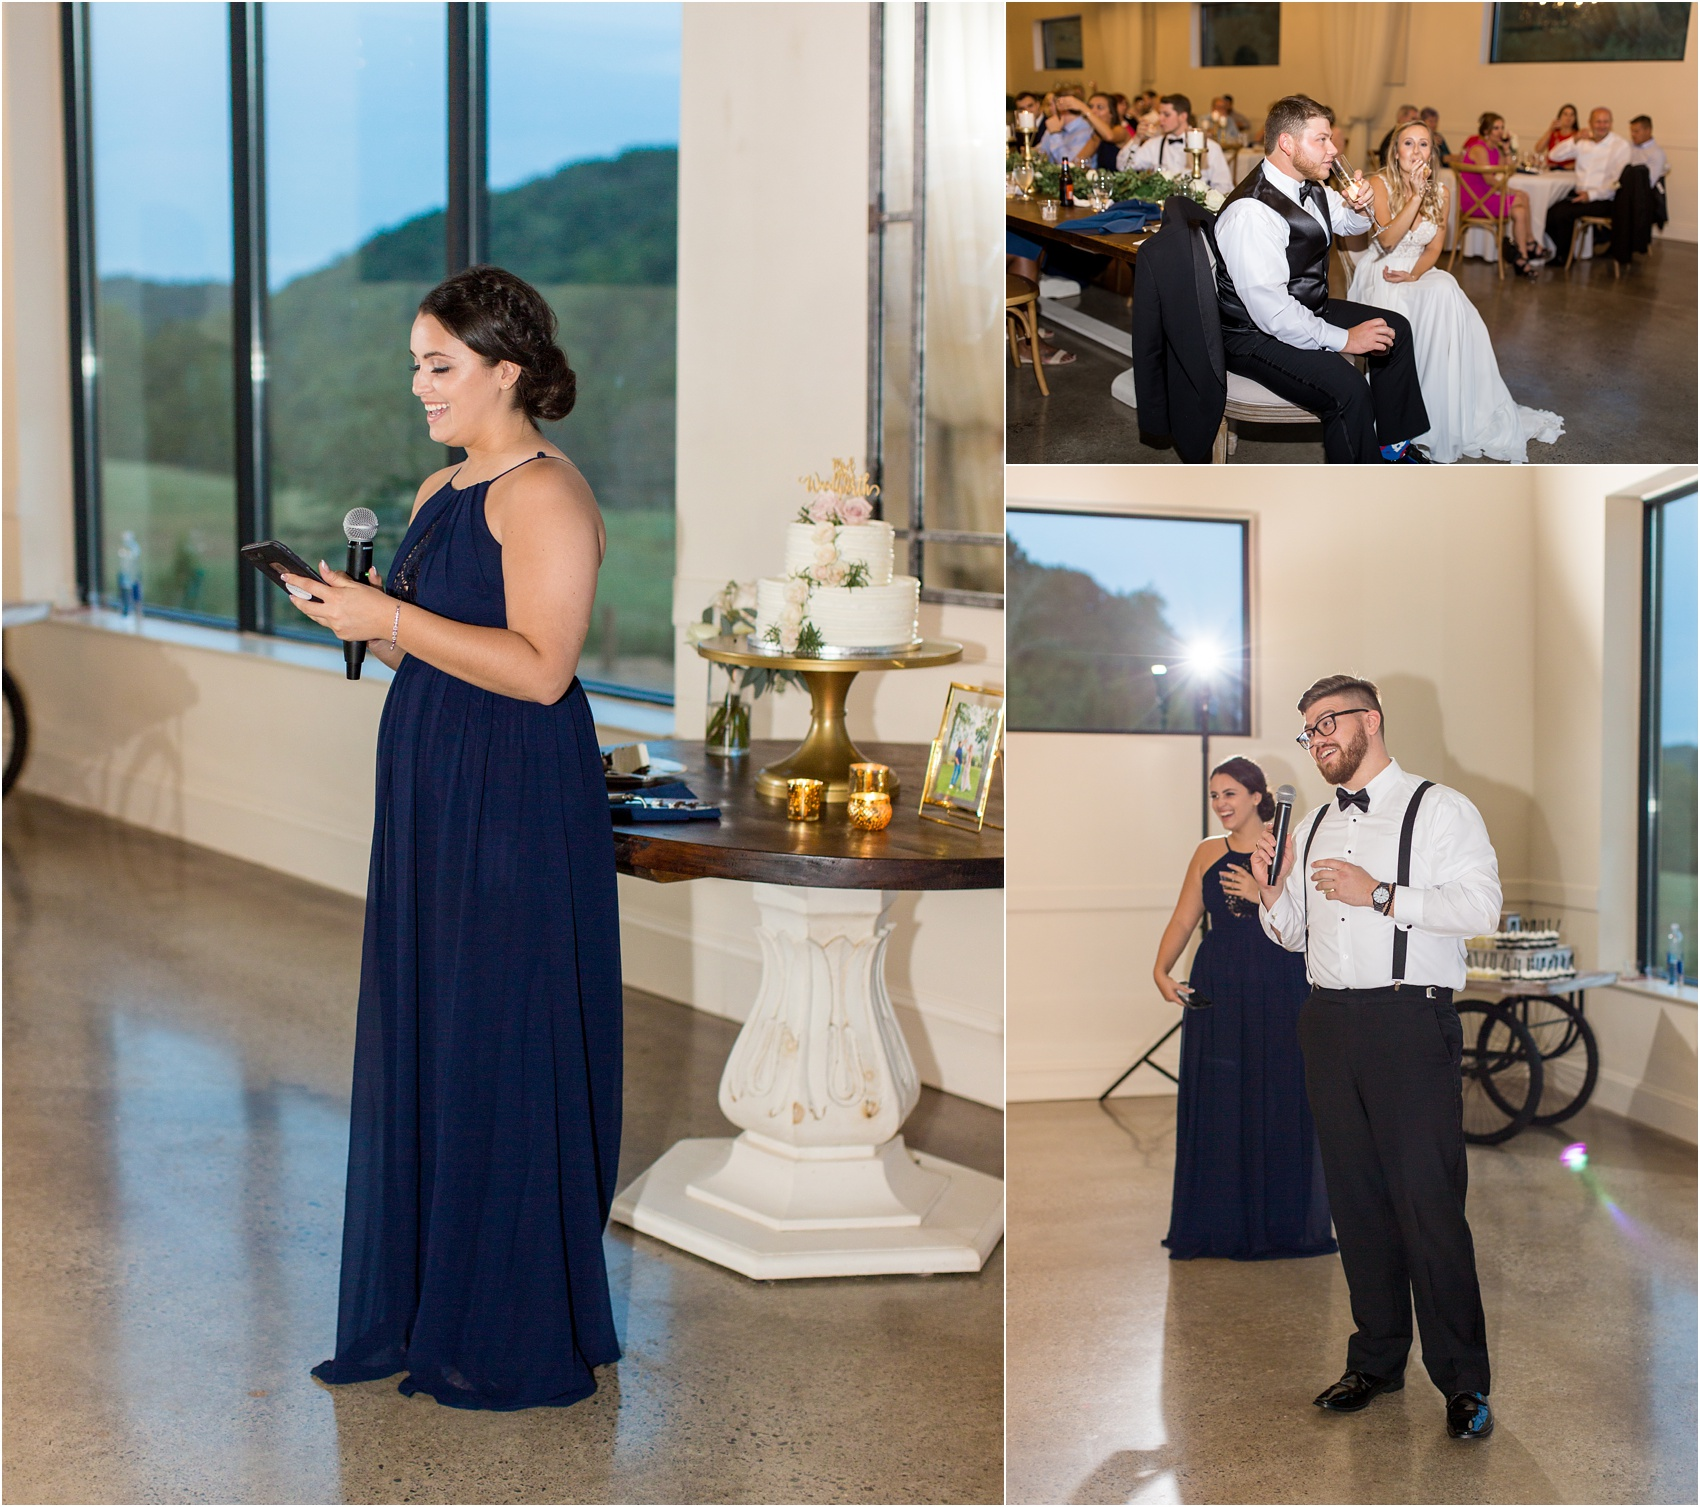 Savannah Eve Photography- Jurek-Woodworth Wedding- Sneak Peek-88.jpg